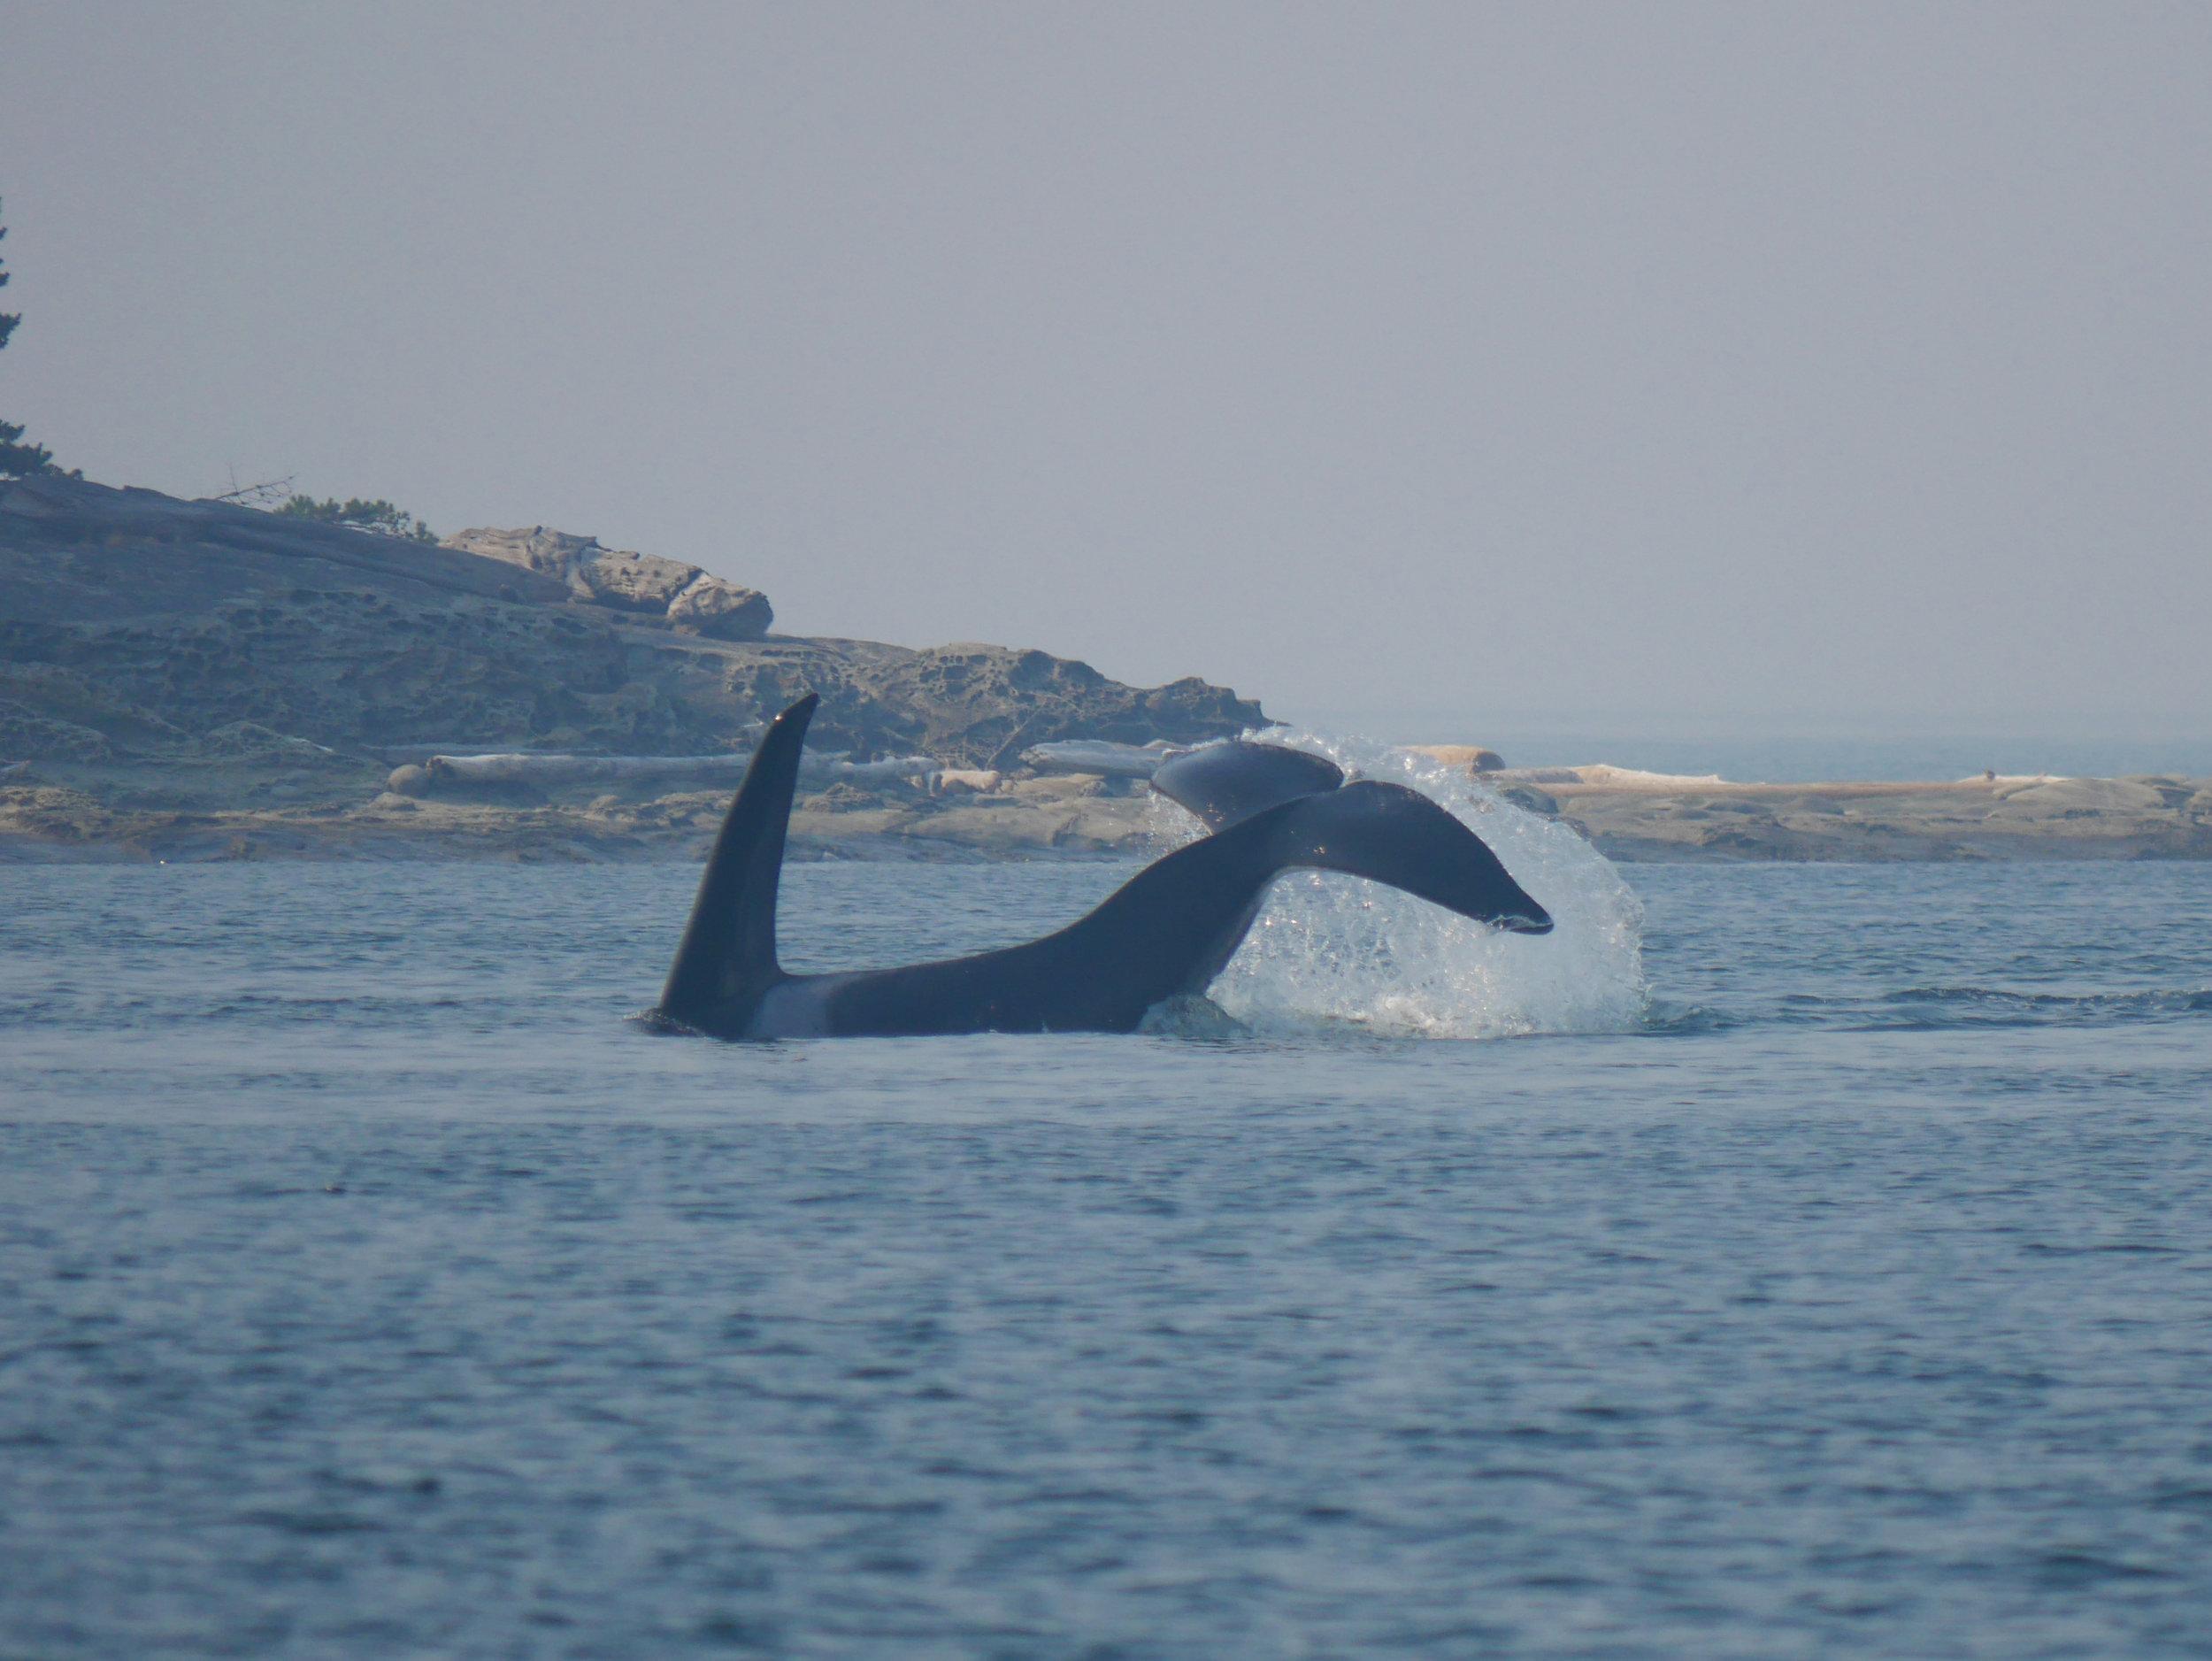 Another tail slap!Photo by Alanna Vivani